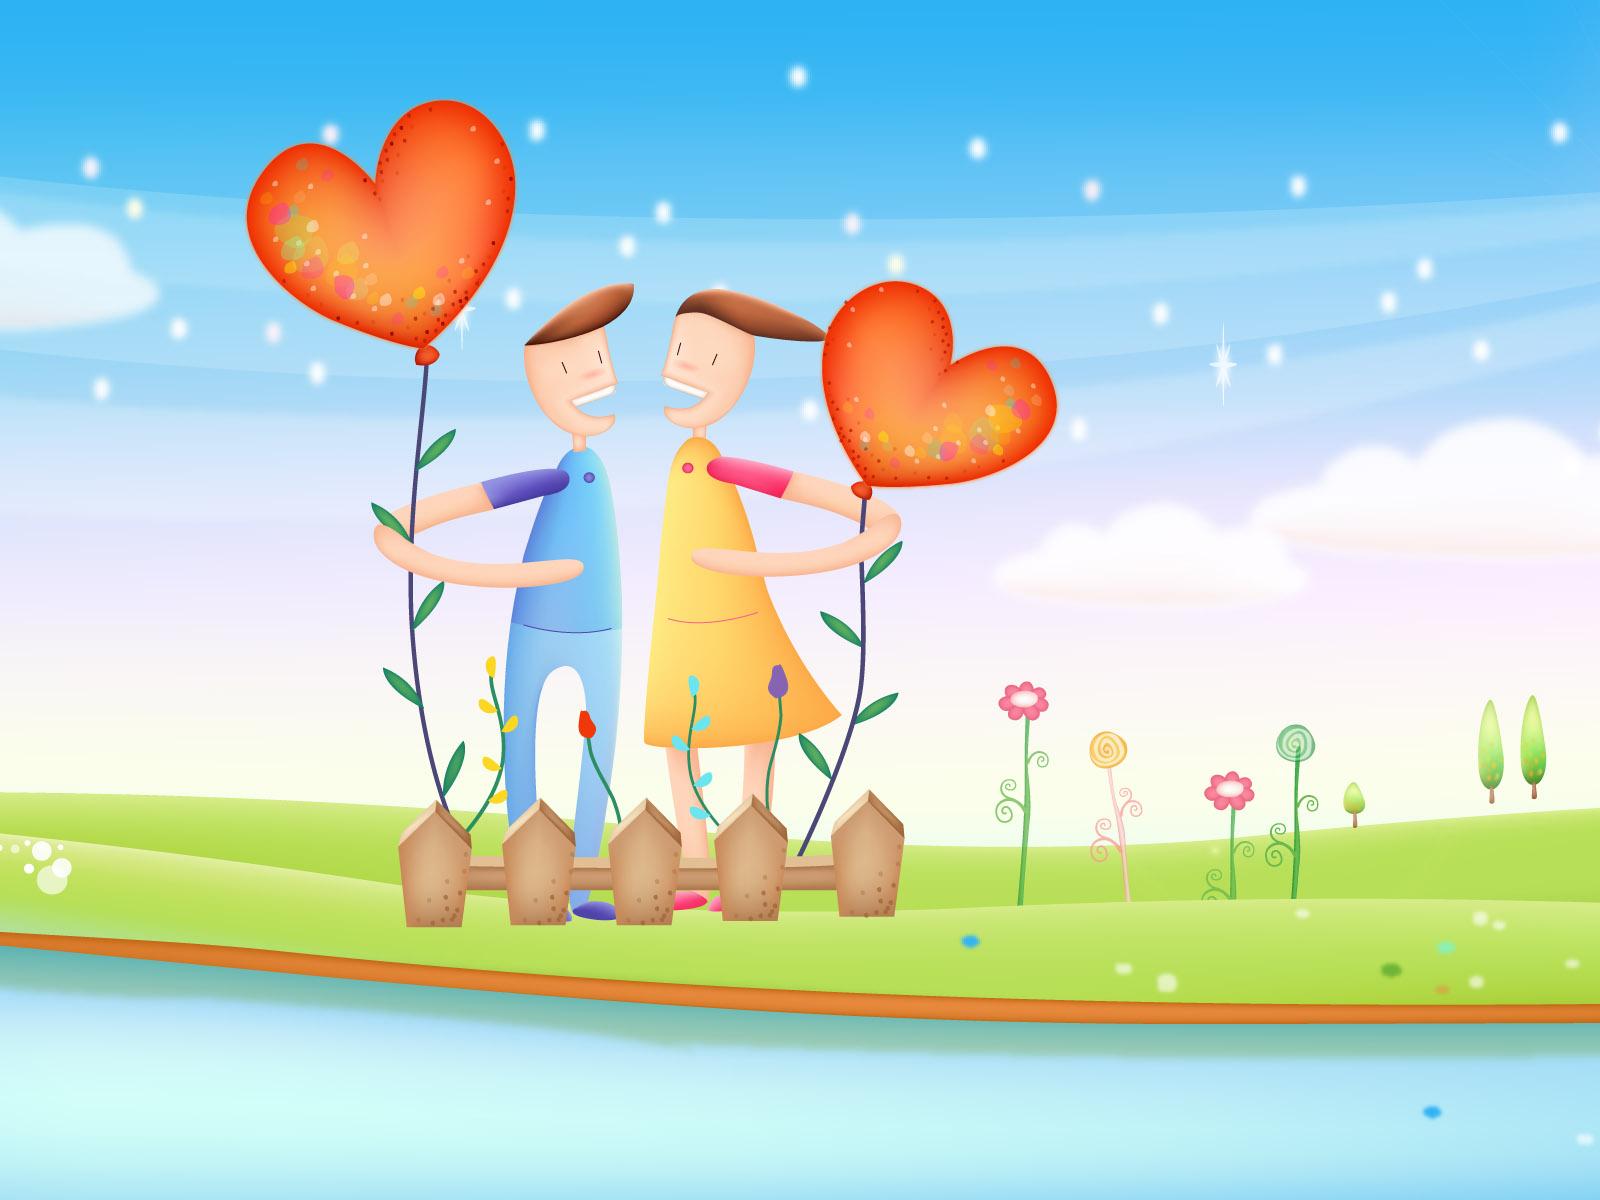 http://2.bp.blogspot.com/-iGkIUBBmnbk/TwMuLEH20zI/AAAAAAAABDM/wVm4n8UgwIw/s1600/Wallpaper+Love+2.jpg